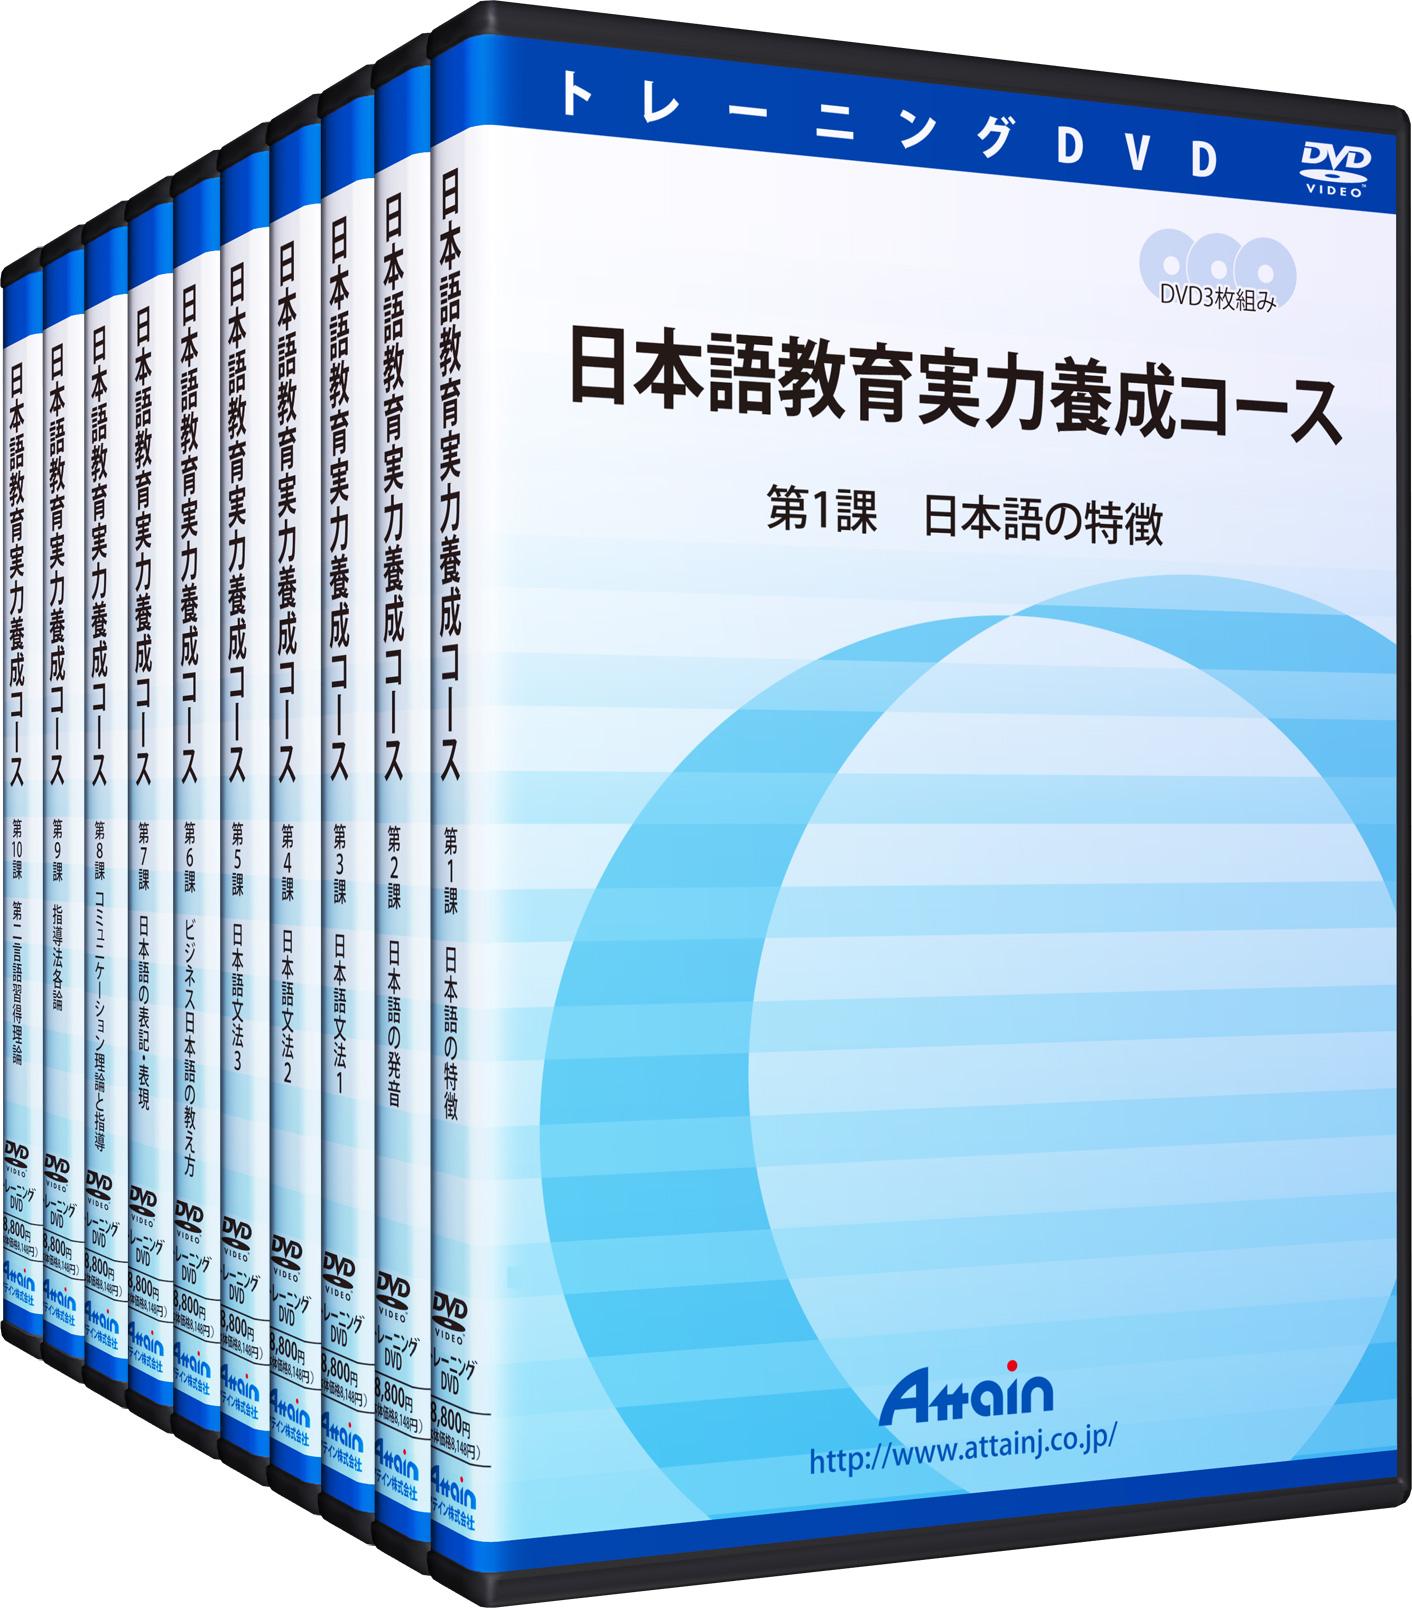 図書館向け「日本語教師養成講座(映像教材DVD30枚)」を10巻セットで販売開始